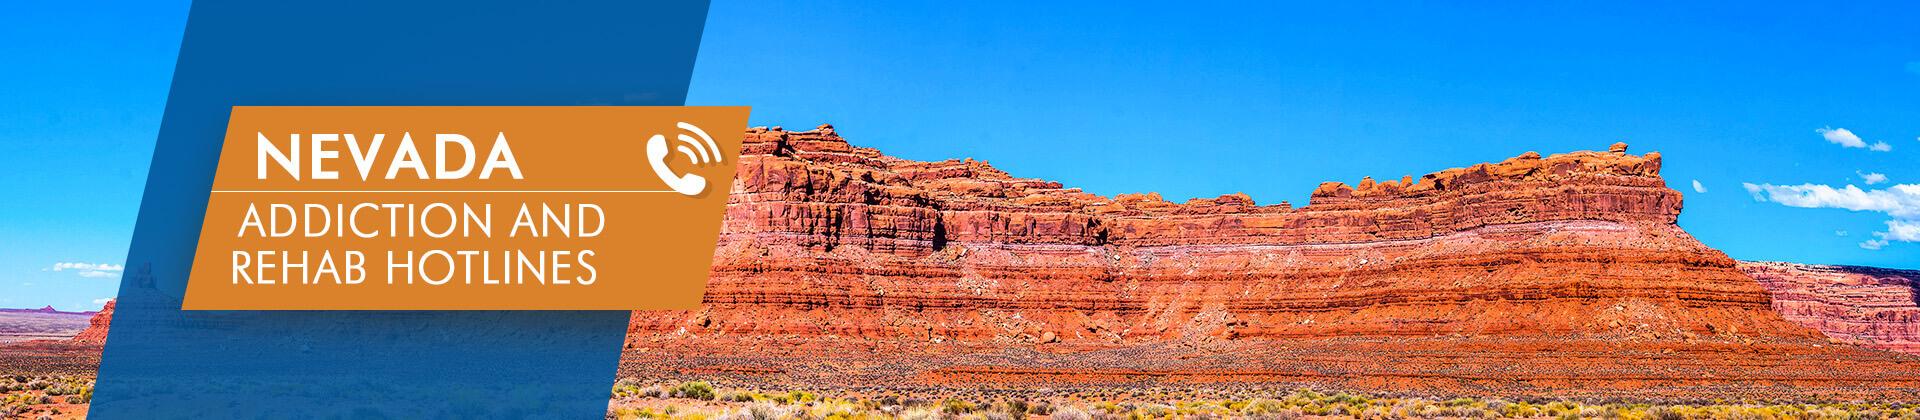 Nevada addiction and rehab hotlines